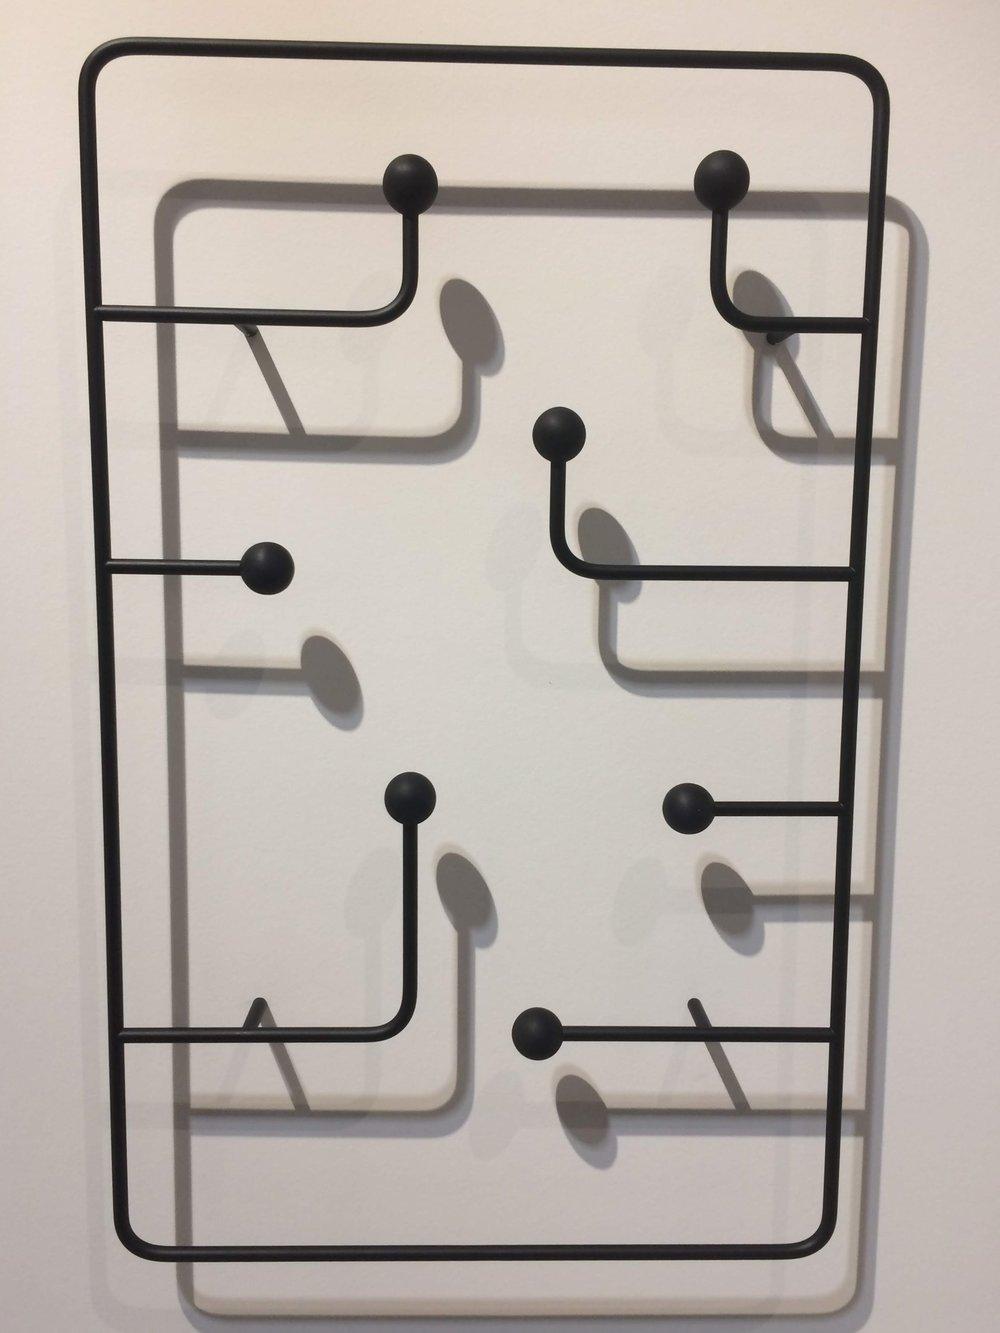 Hang Around coat rack by Joy Charbonneau & Derek McLeod. KARAKTER